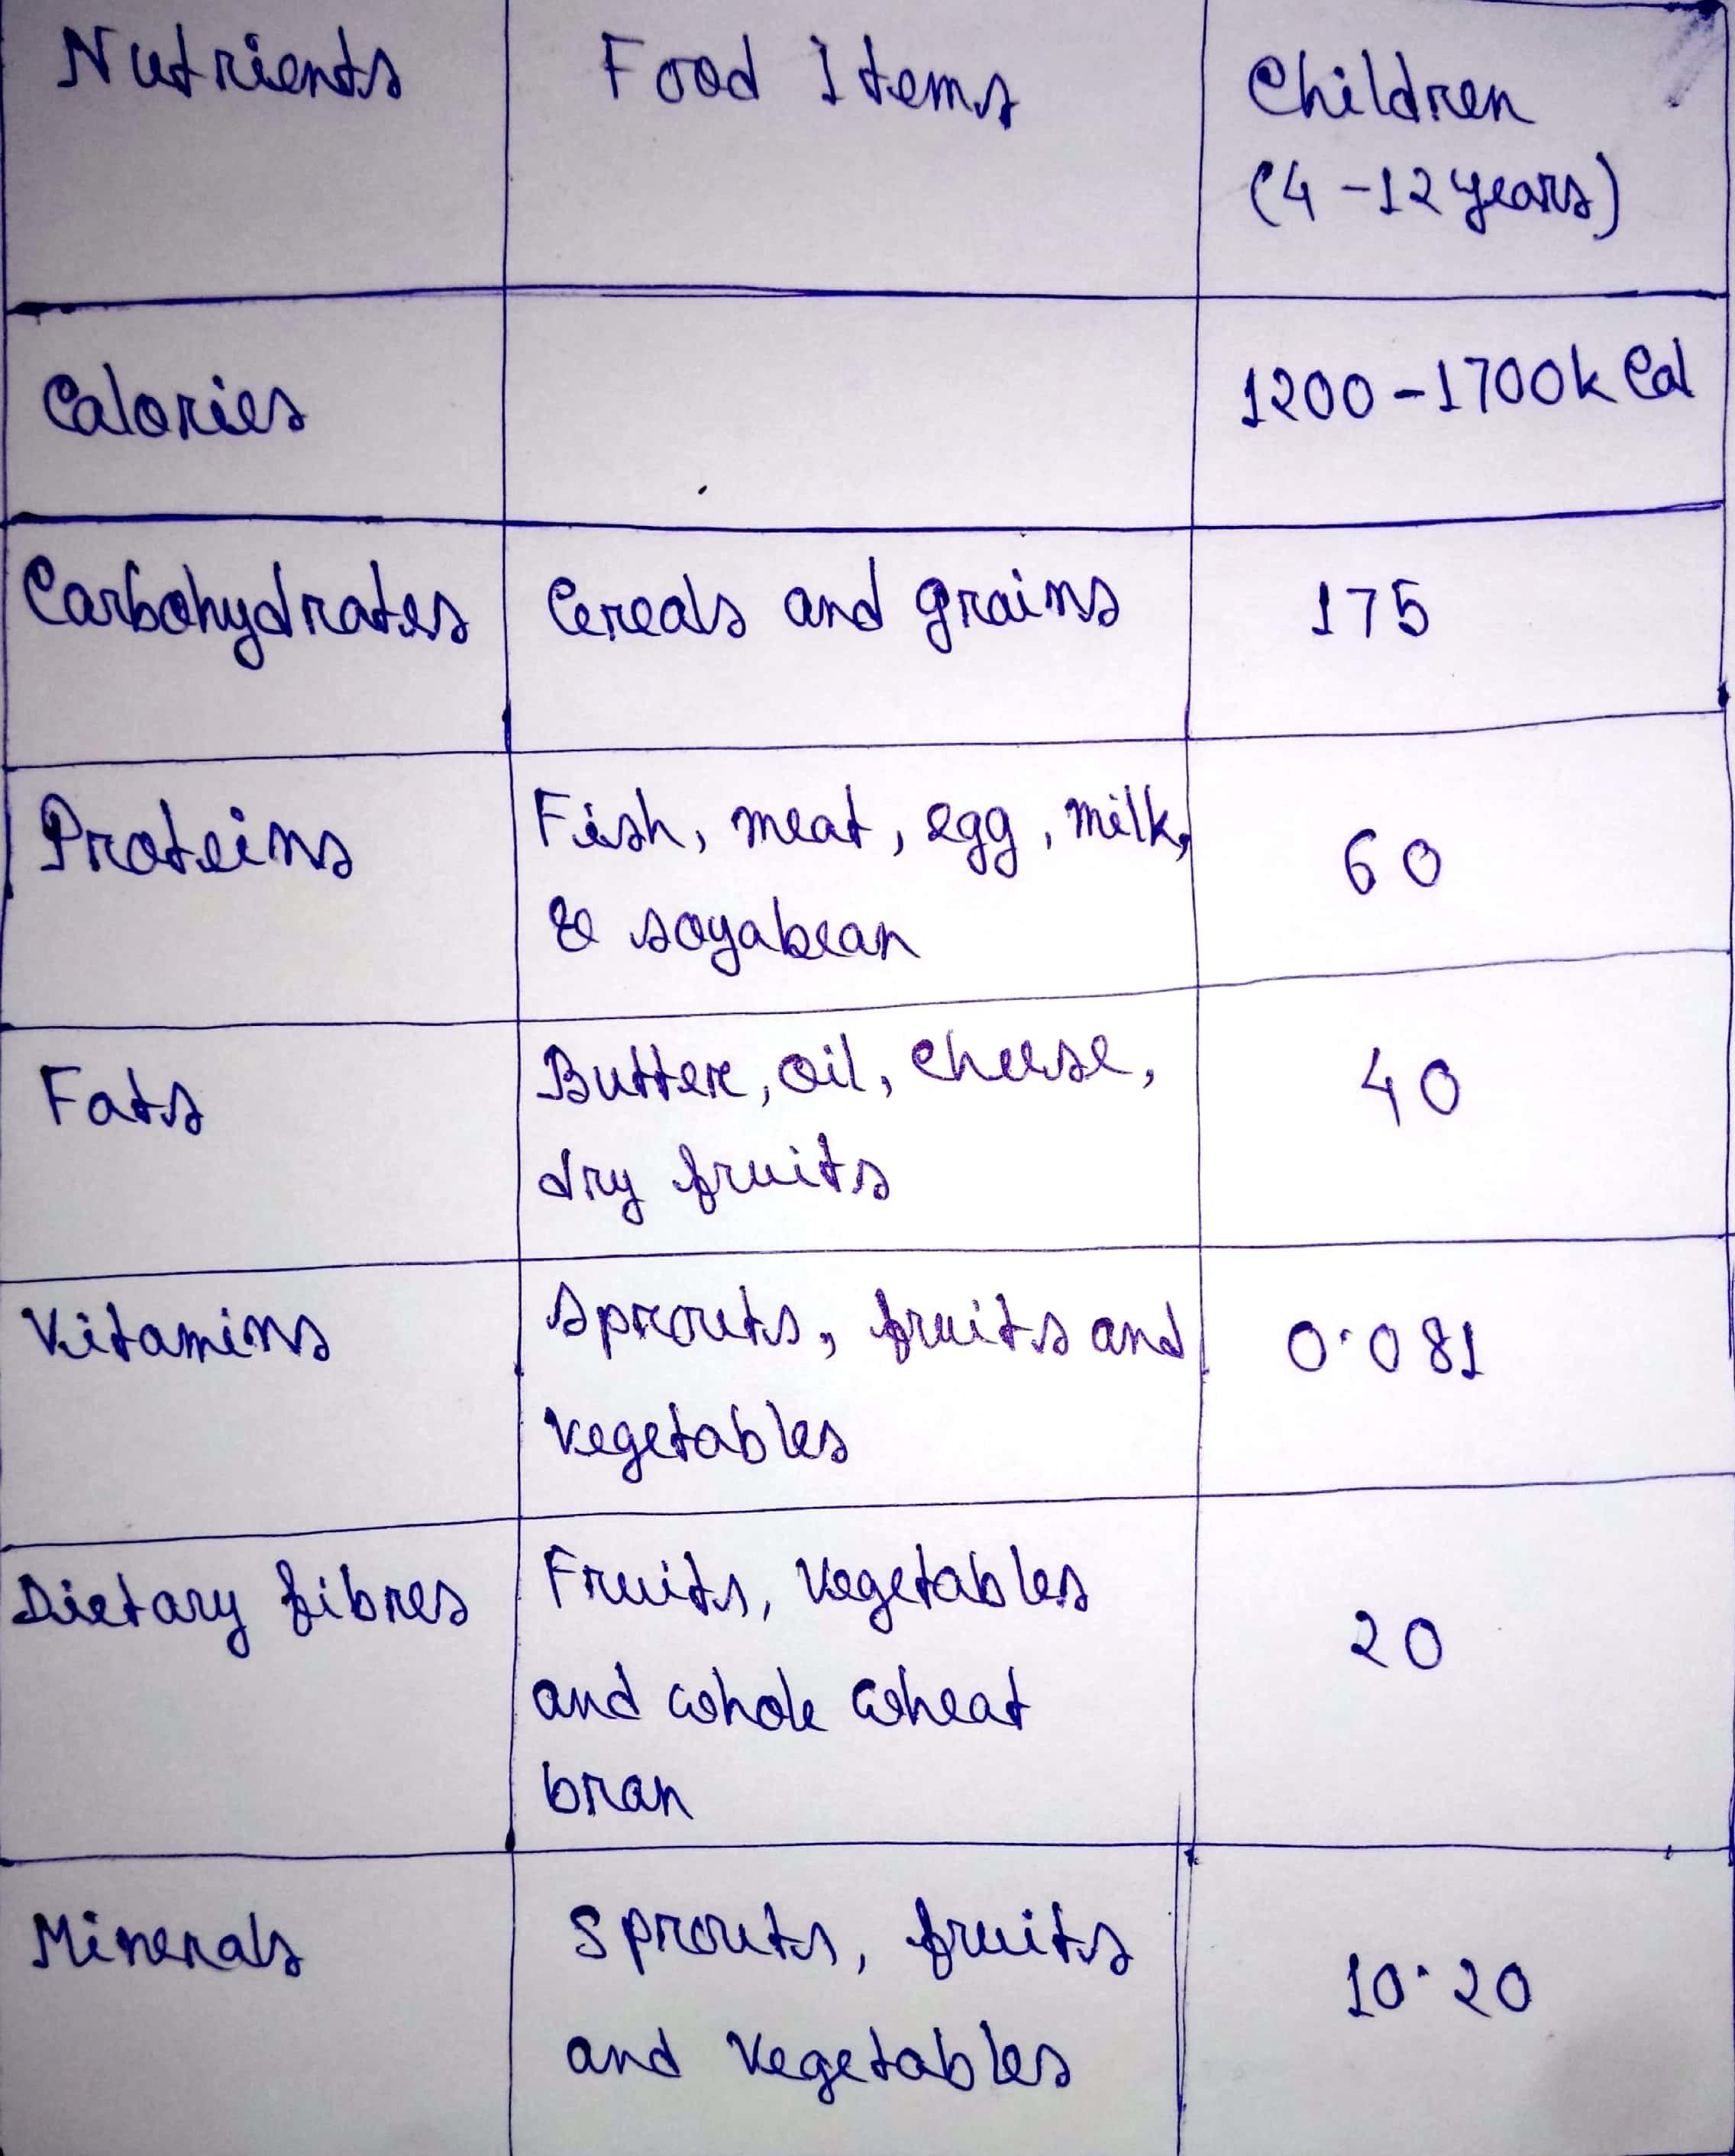 diet chart for school going child